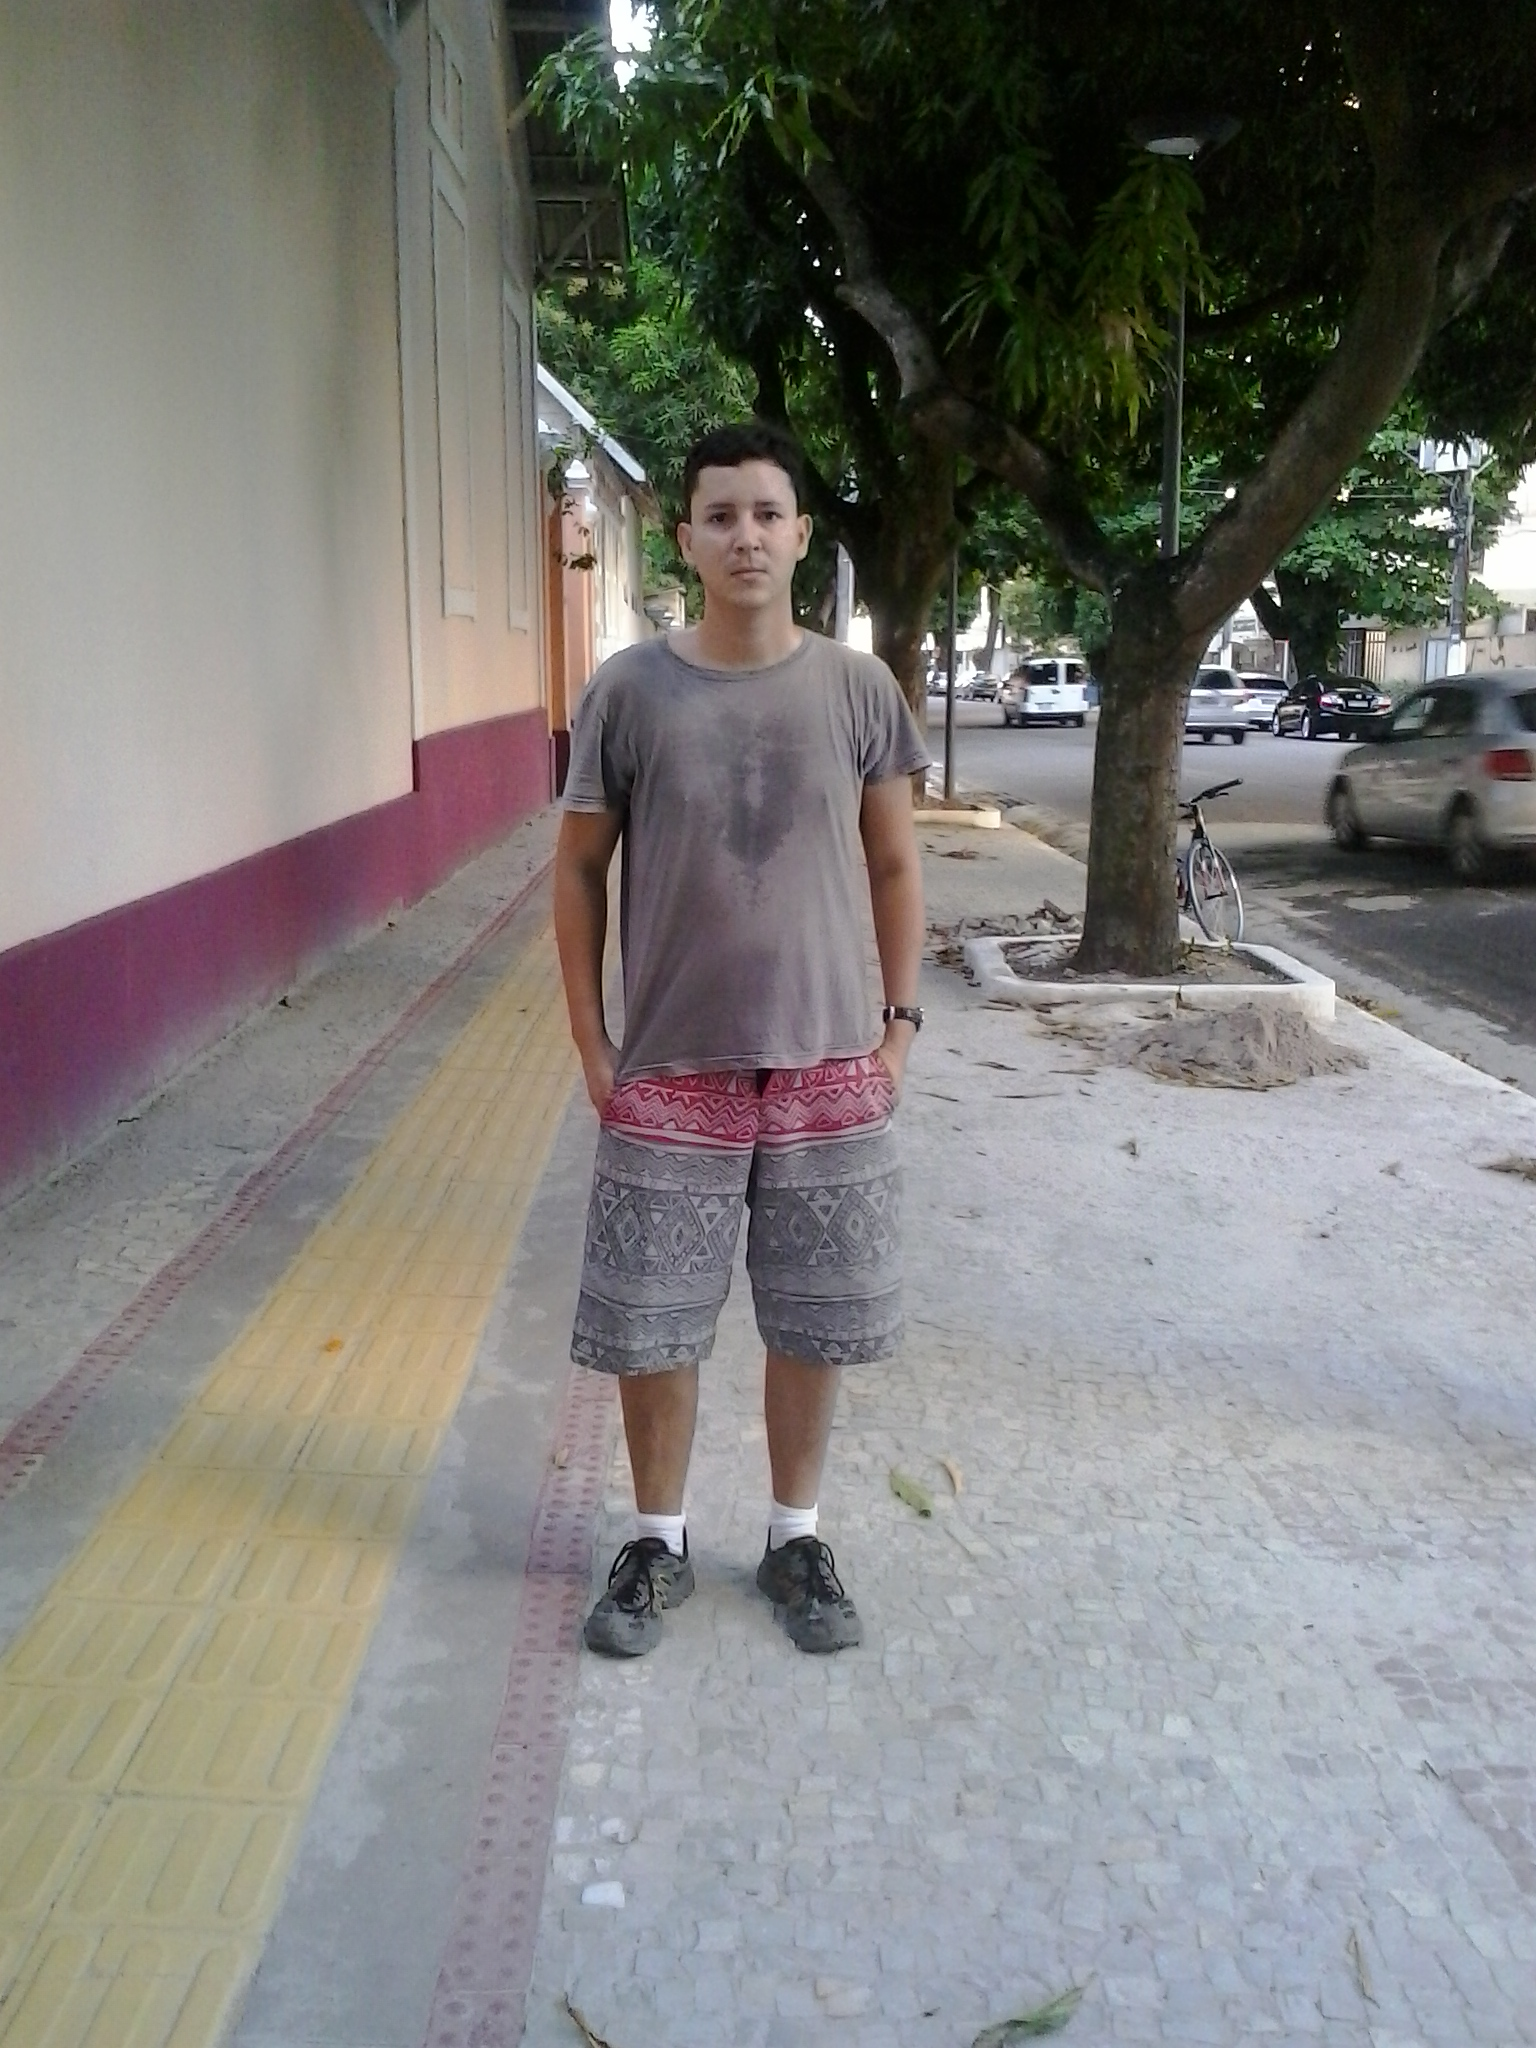 Carlos Allan Madureira Cruz